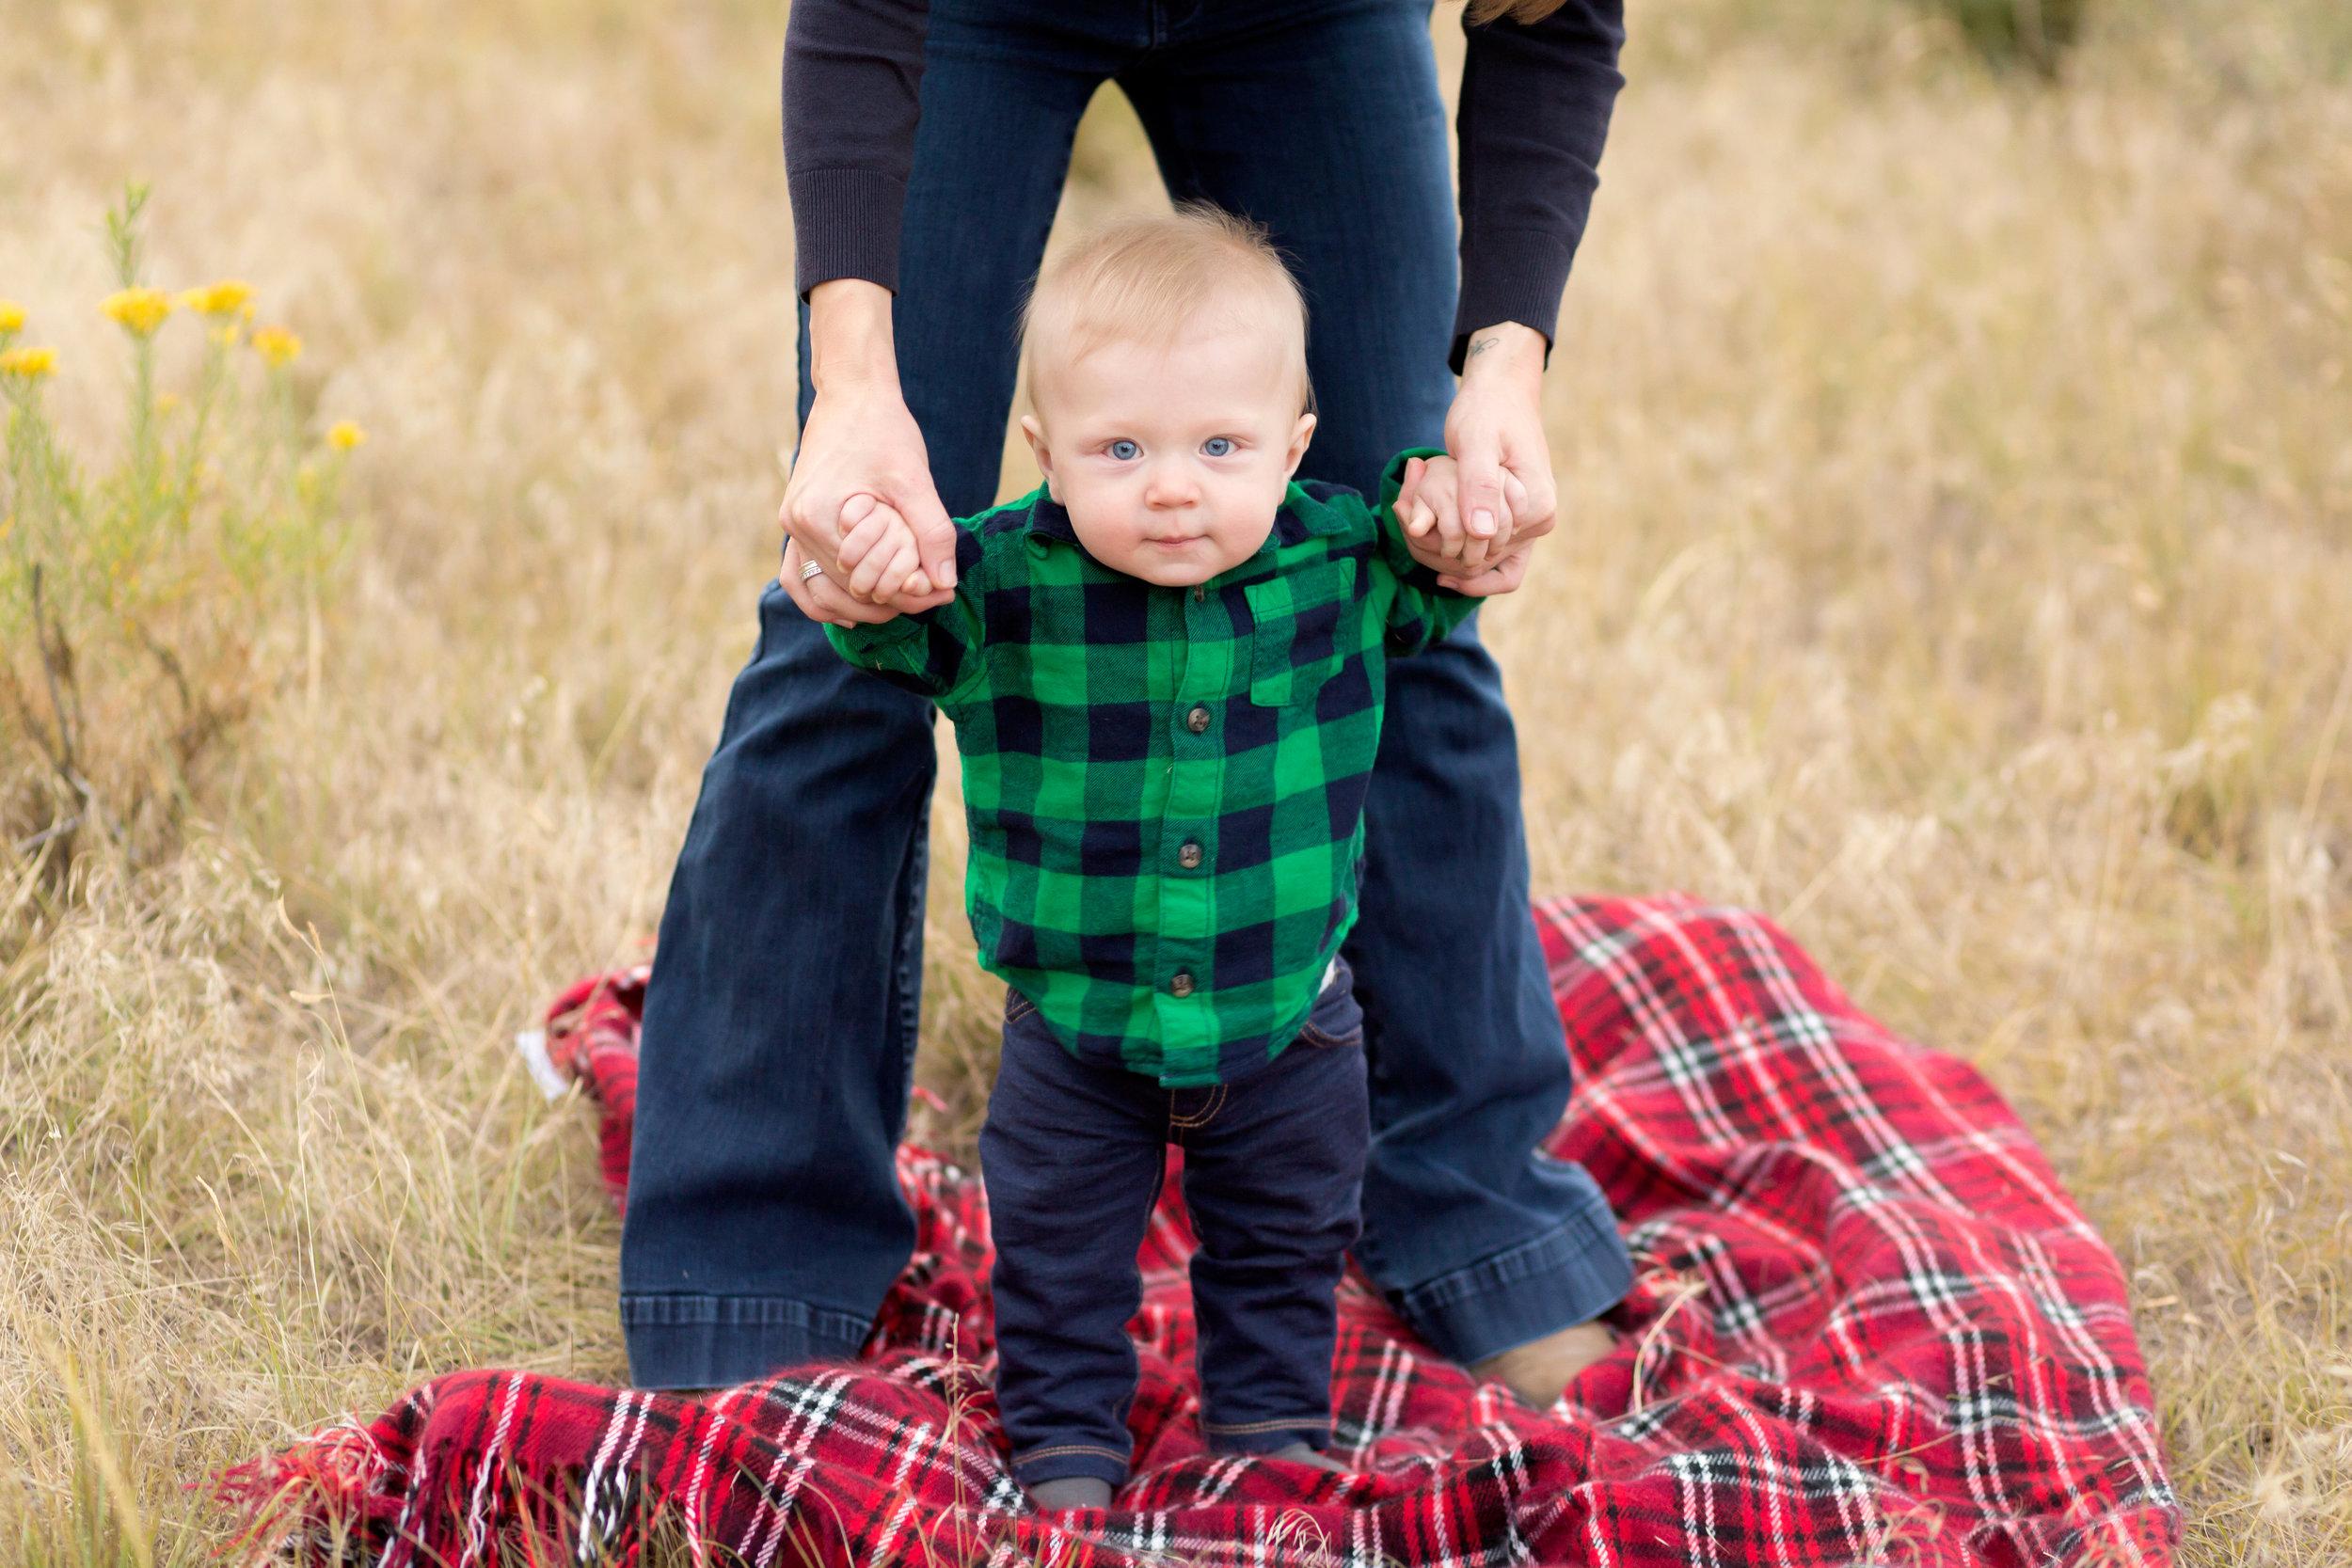 Denver Newborn Photographer, Boulder Newborn Photographer, Denver Maternity Photographer, Boulder Maternity Photographer